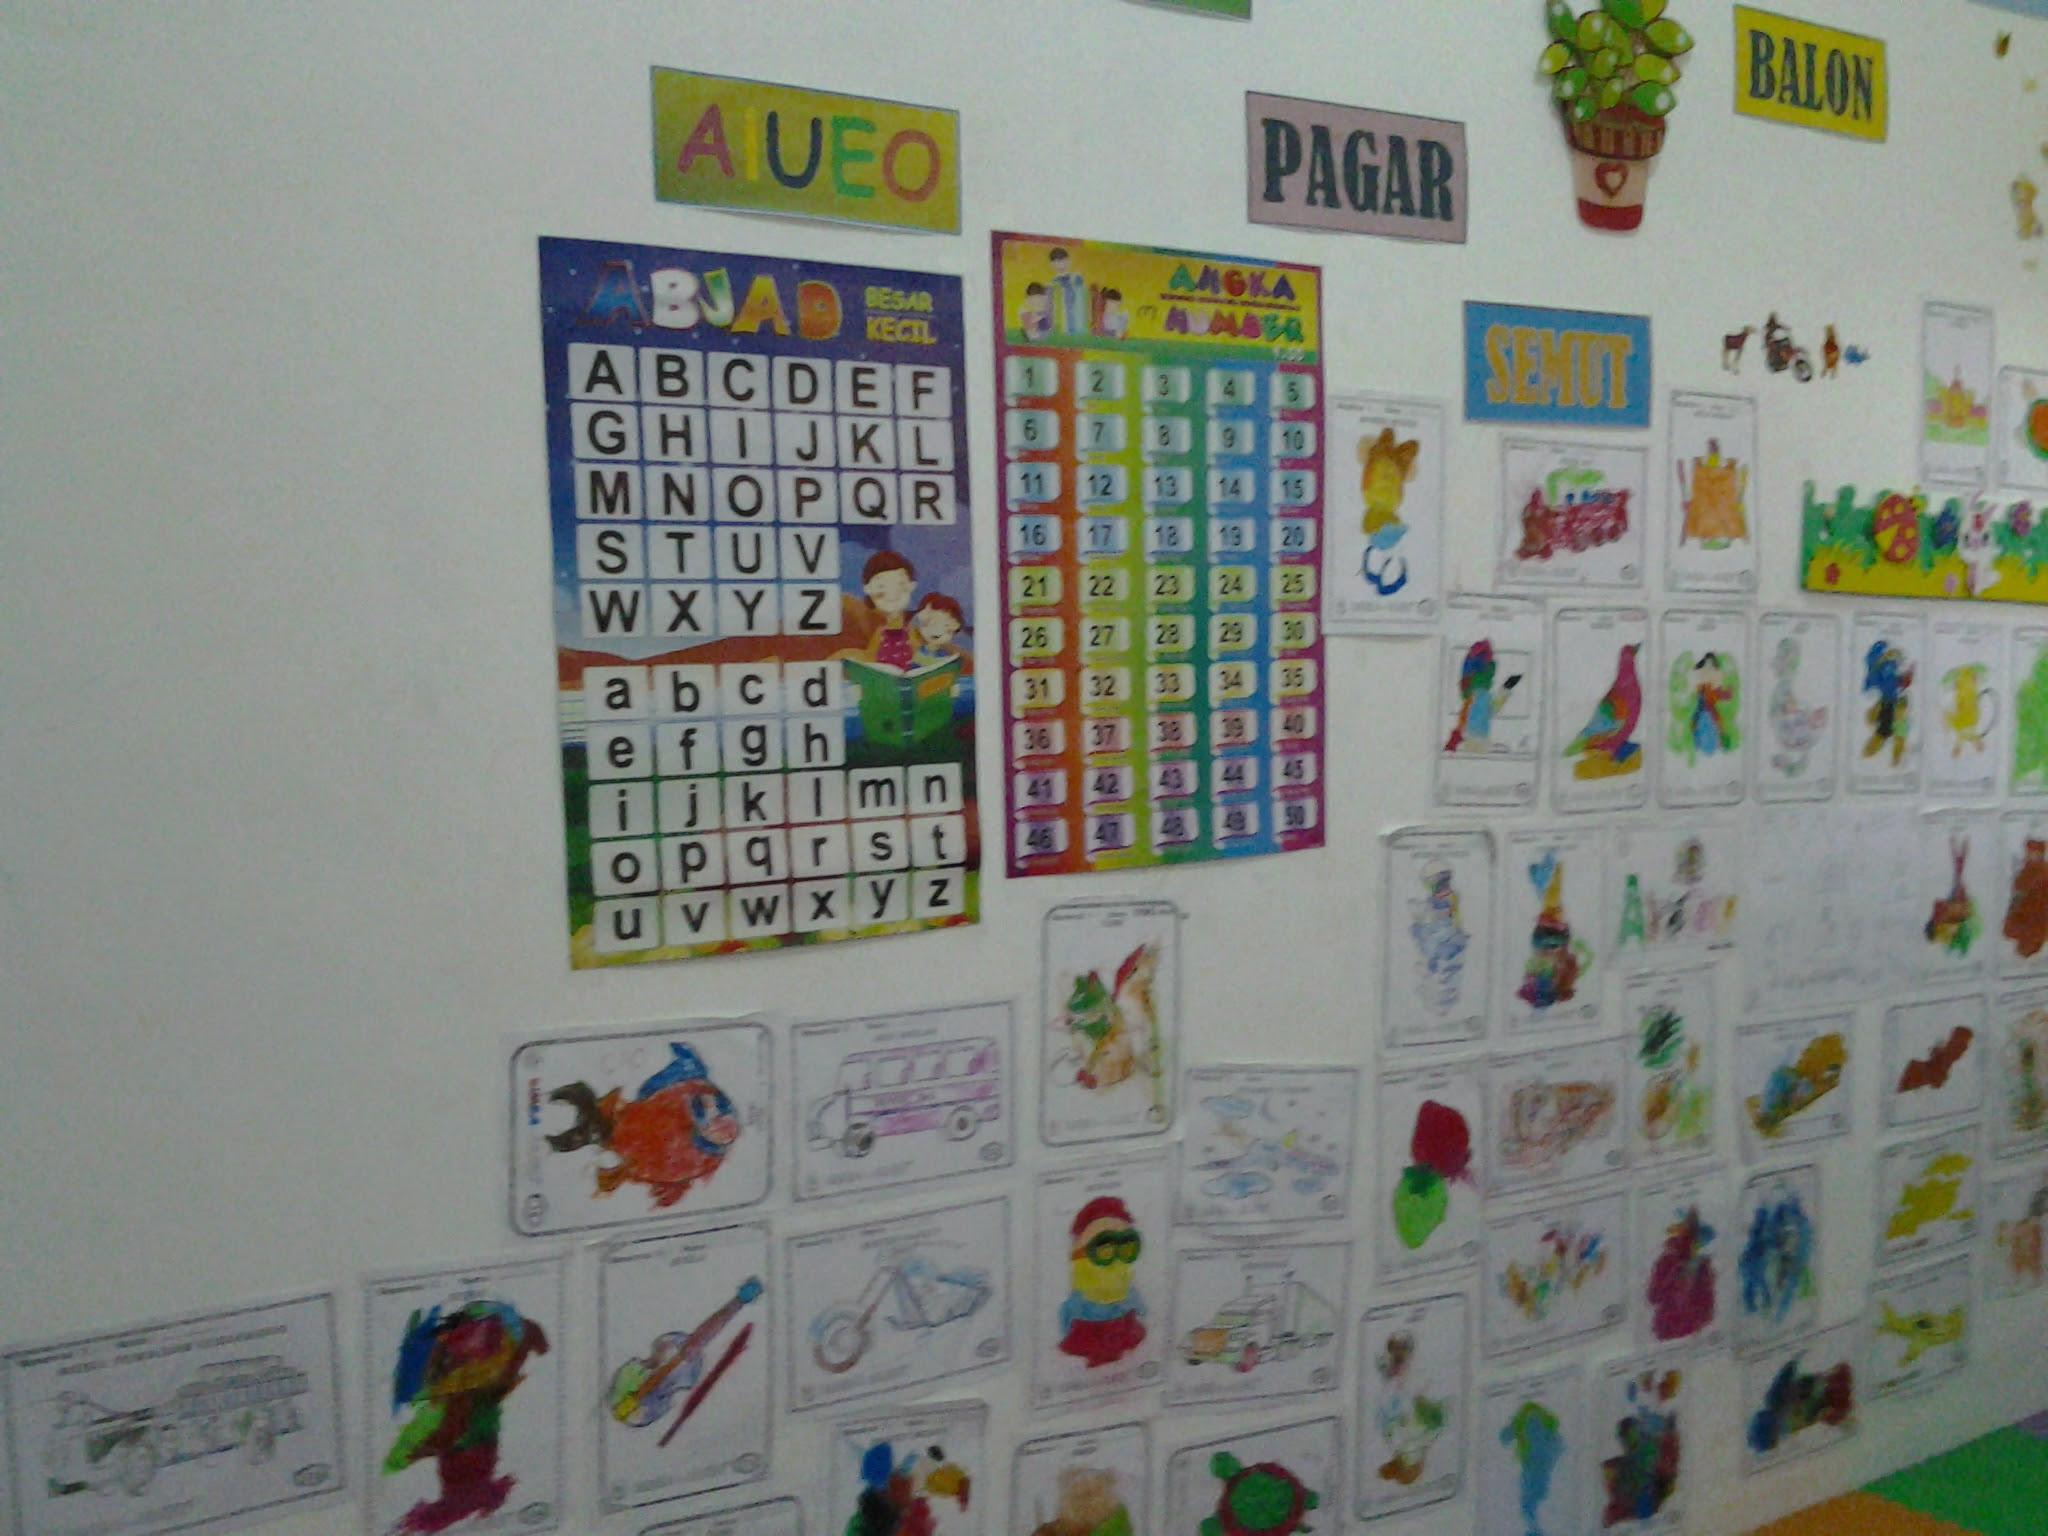 Bimba AIUEO 16 Yayasan Pengembangan Anak Indonesia